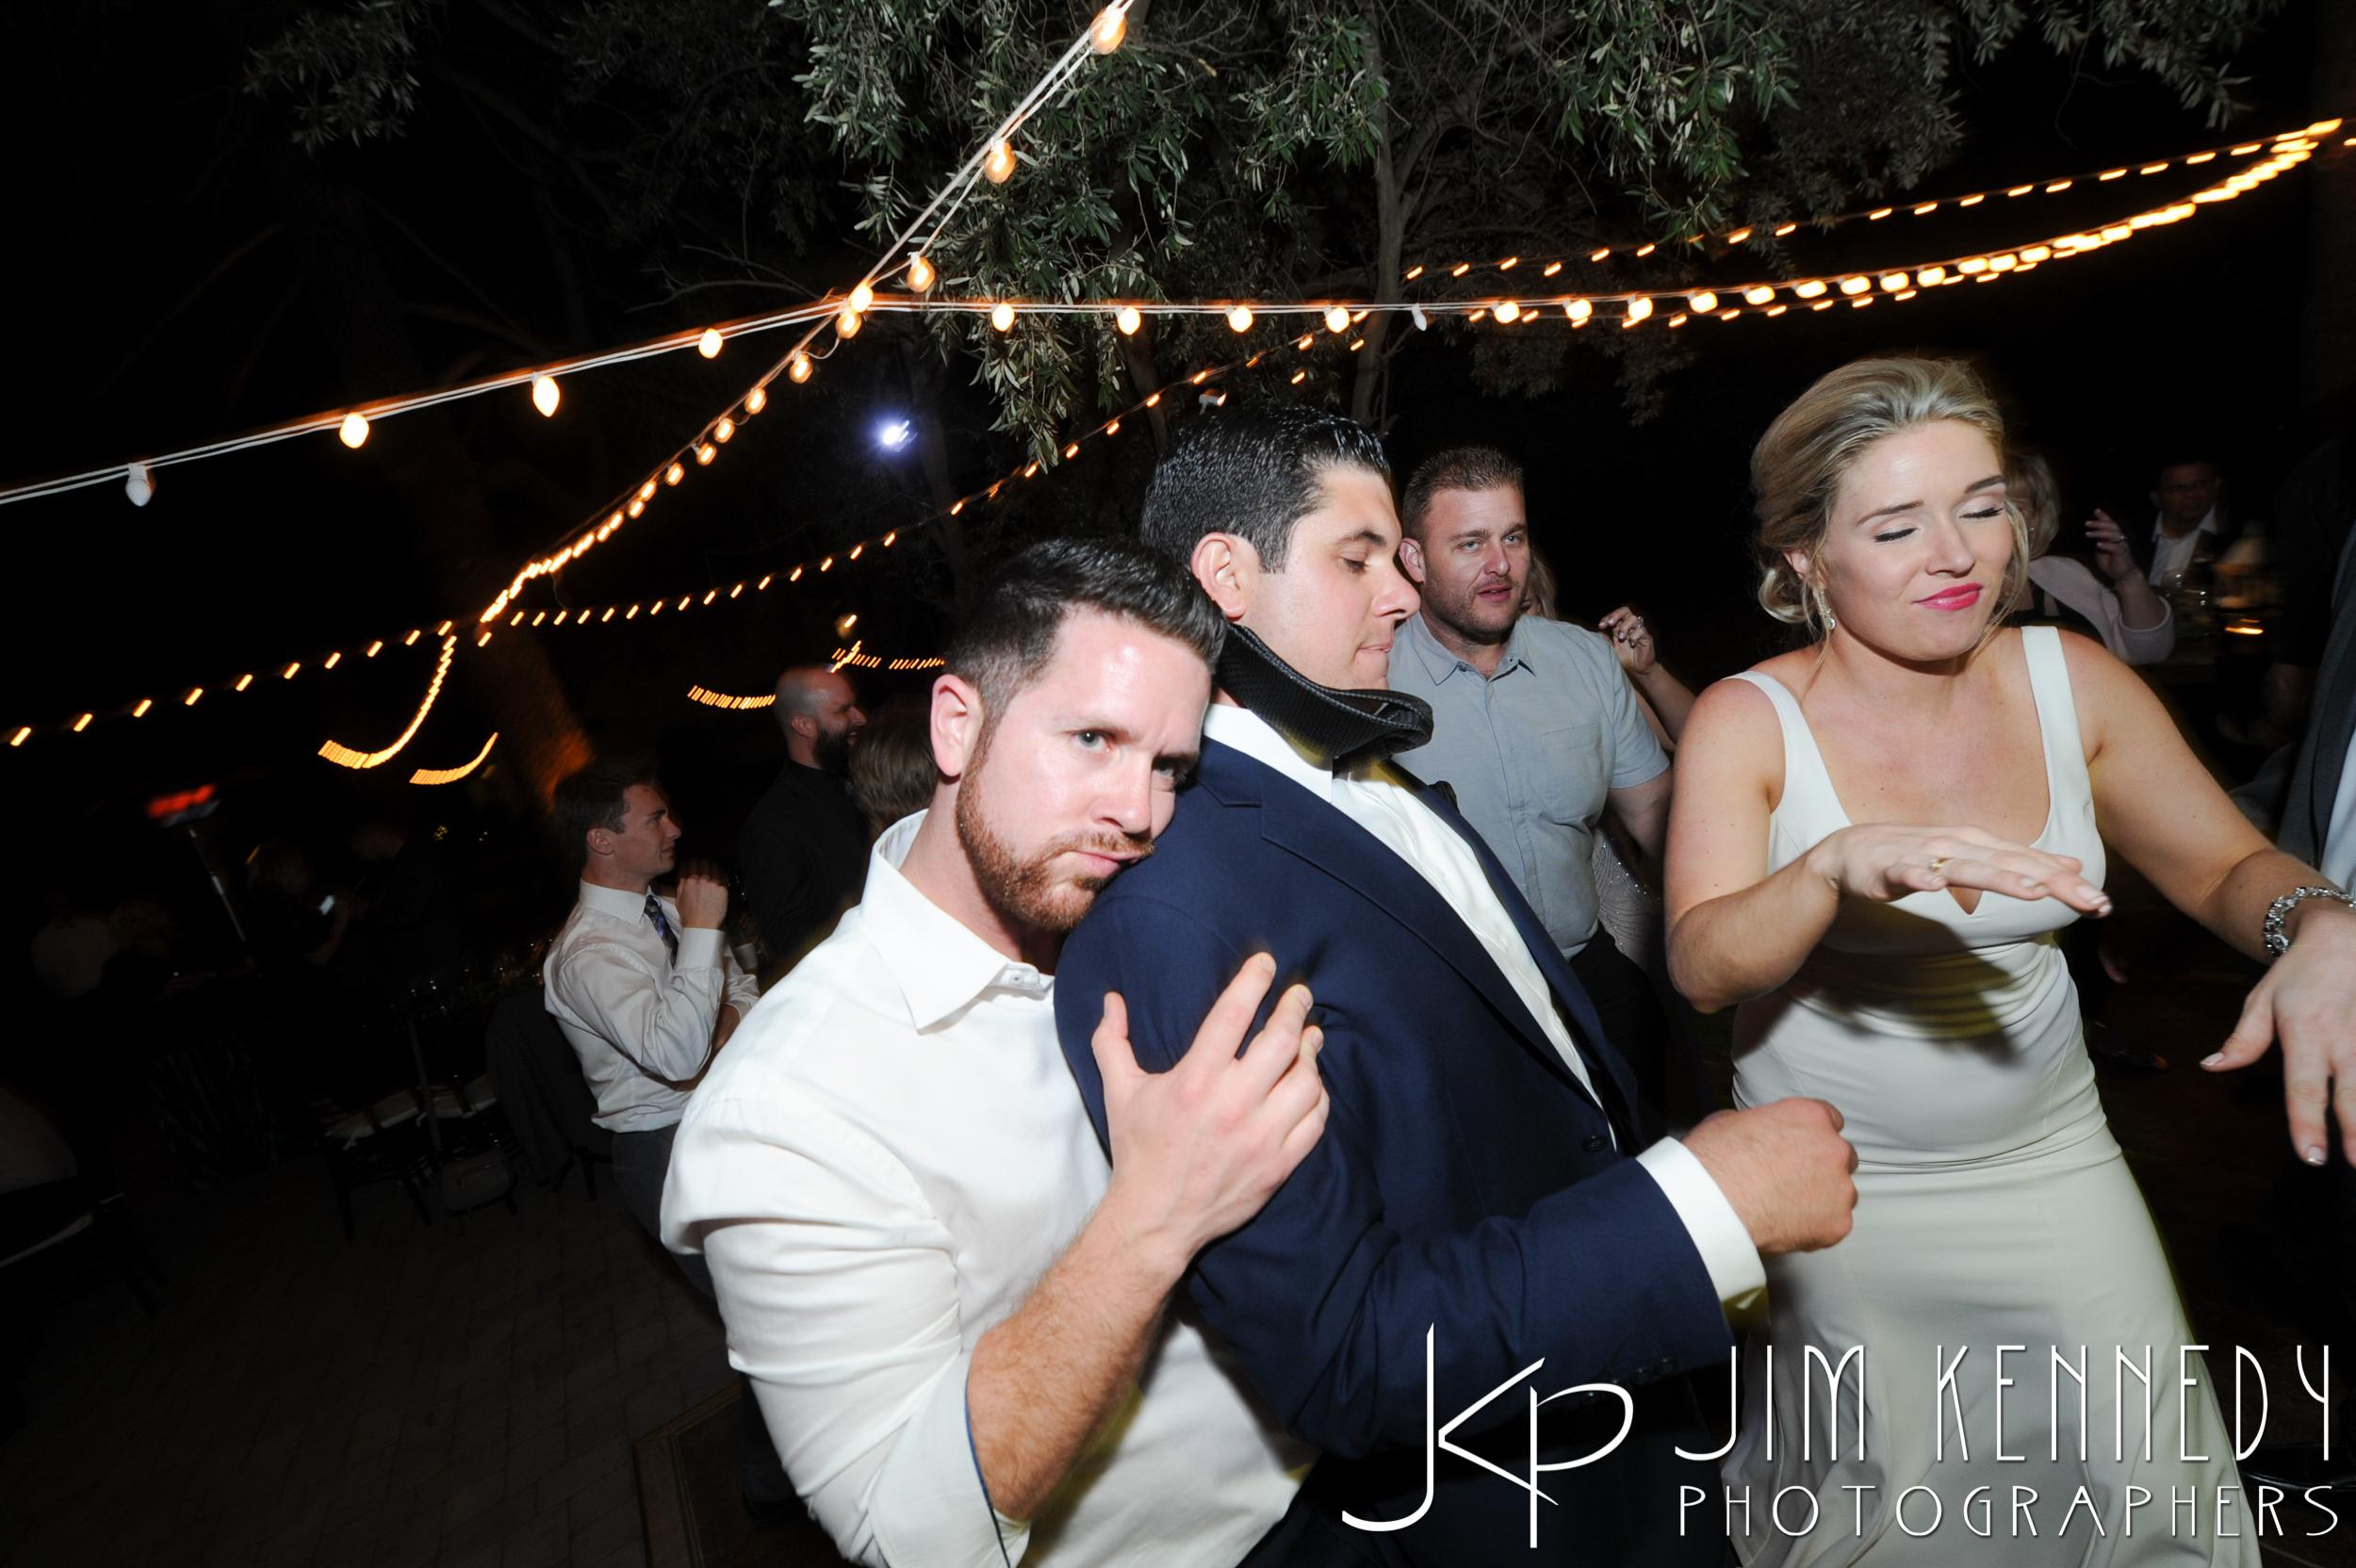 jim_kennedy_photographers_highland_springs_wedding_caitlyn_0215.jpg